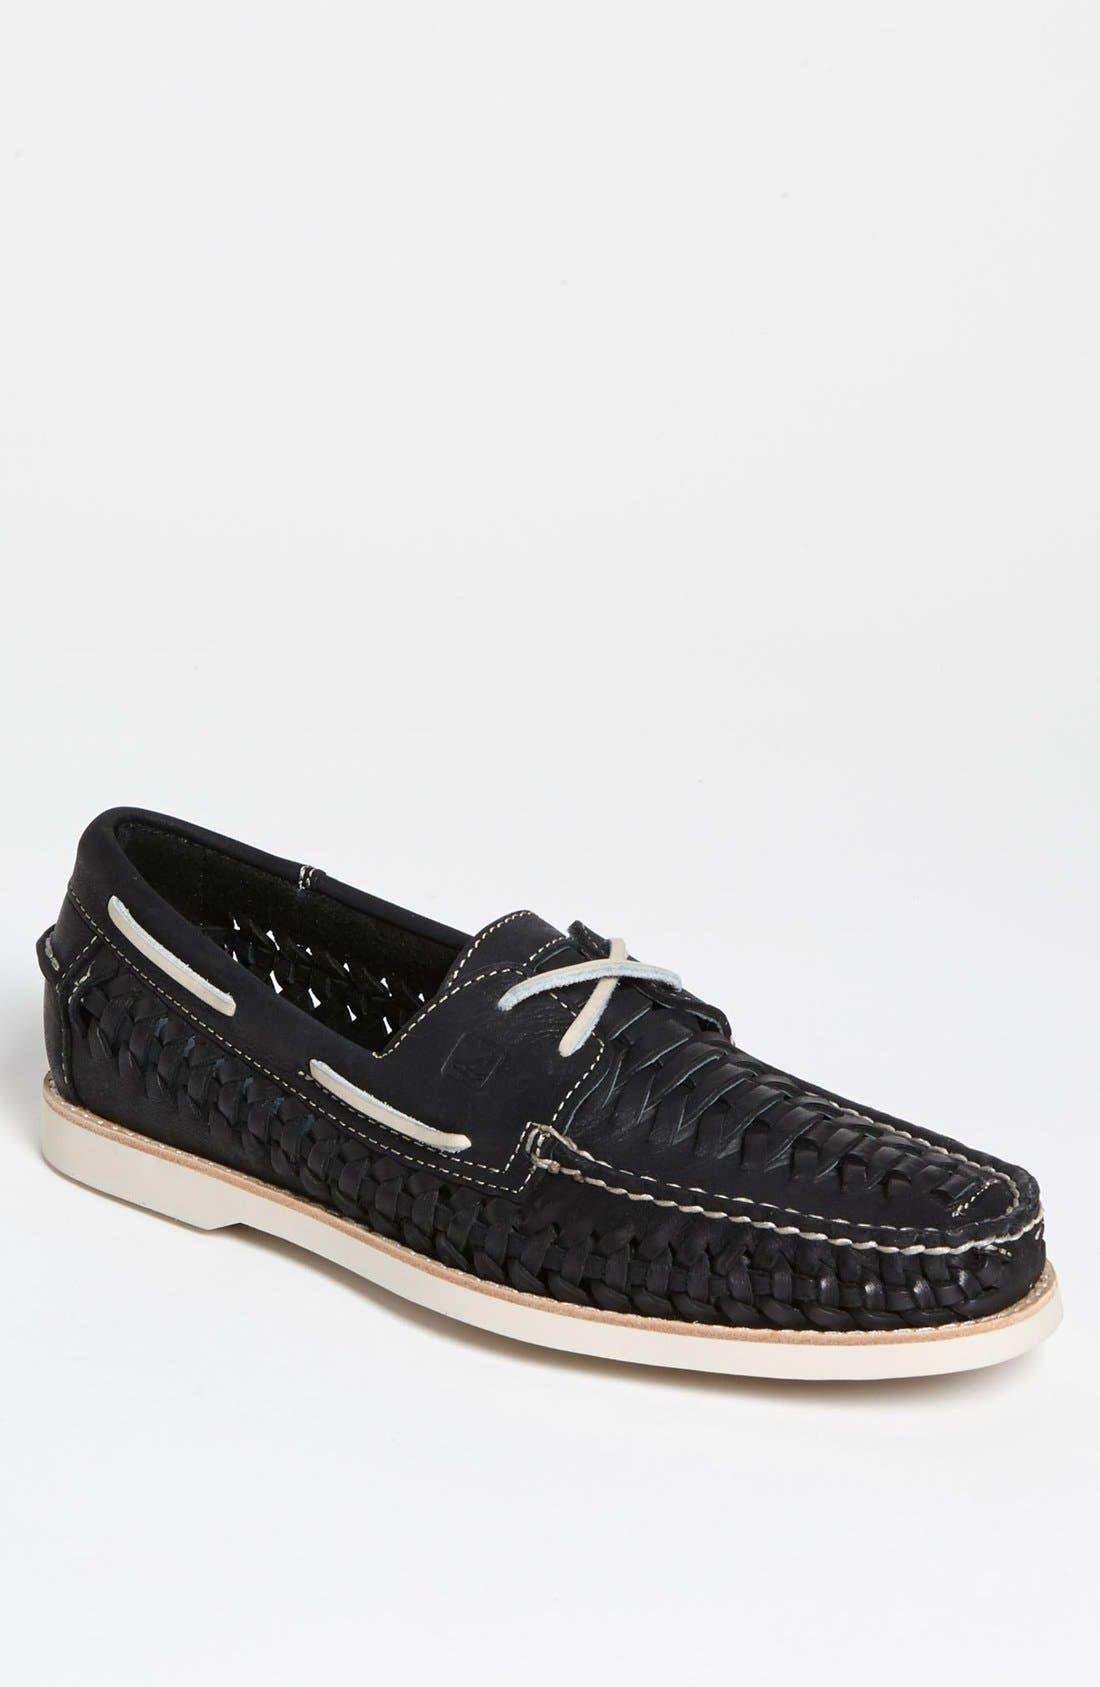 Main Image - Sperry Top-Sider® 'Seaside' Woven Boat Shoe (Men)